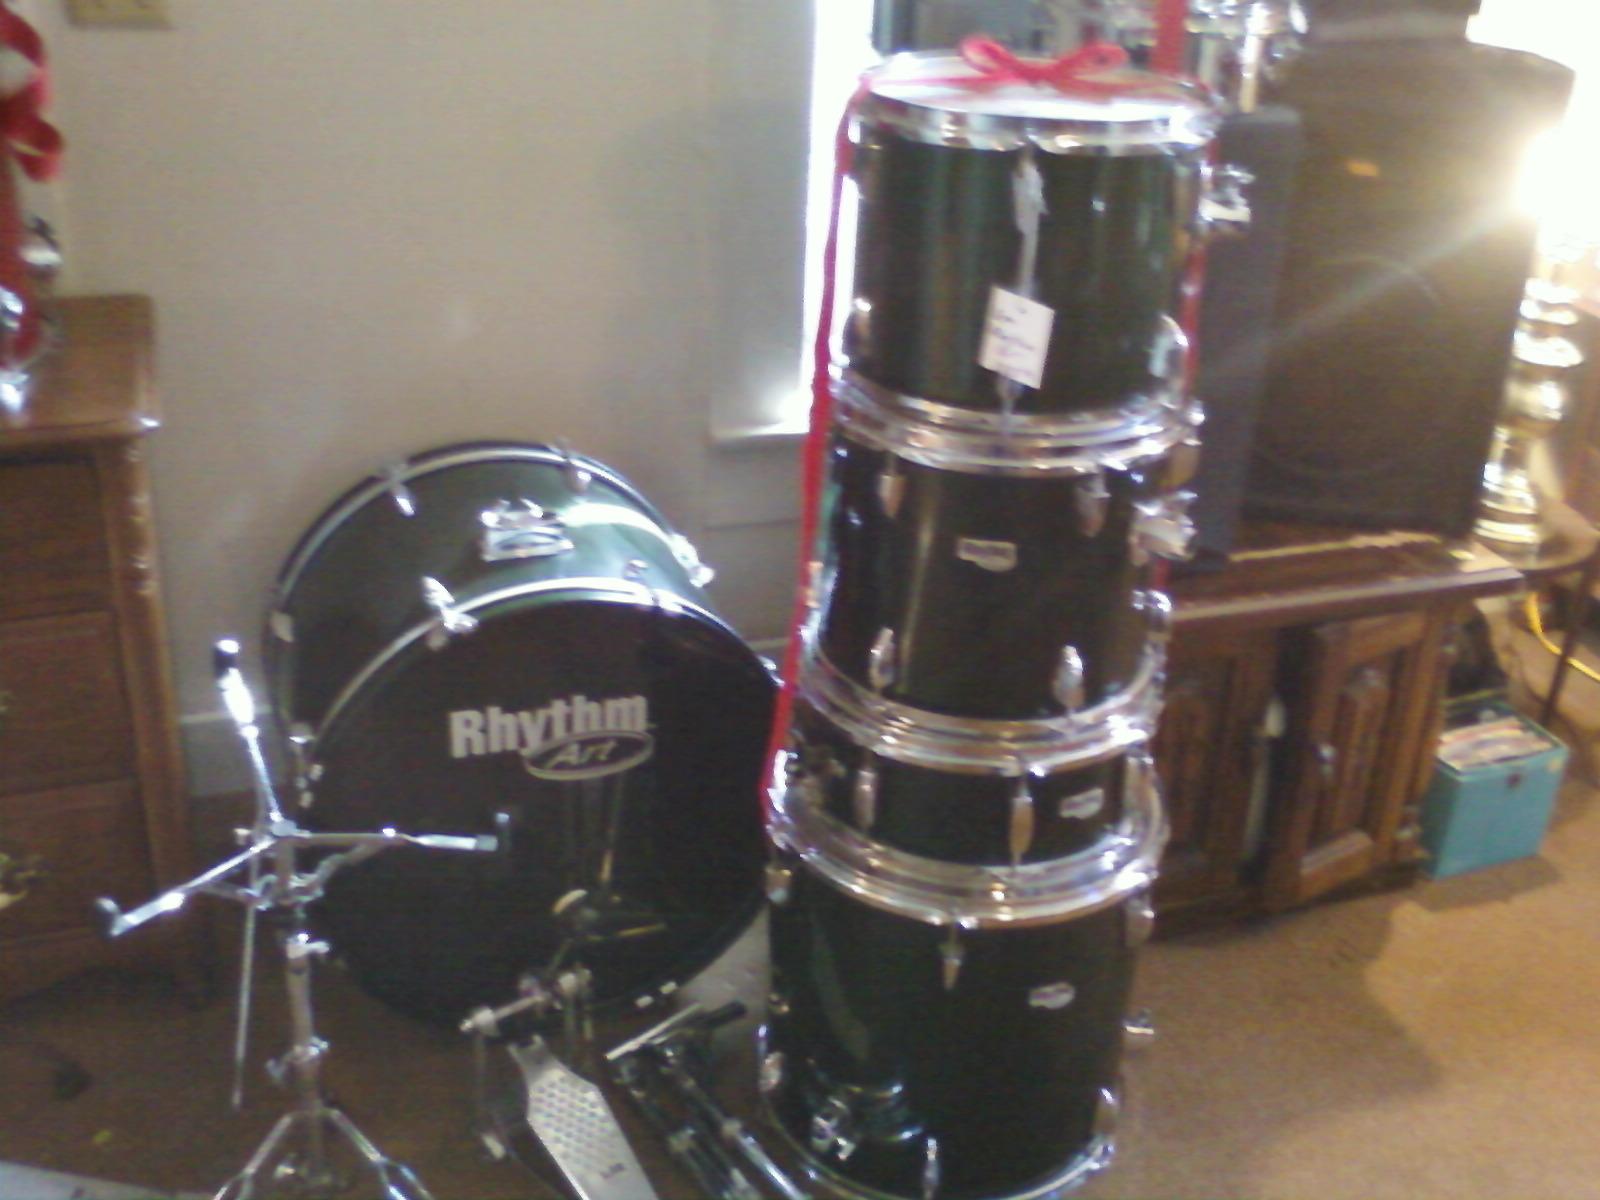 The Drum Line Rhythm Art Drum Kit